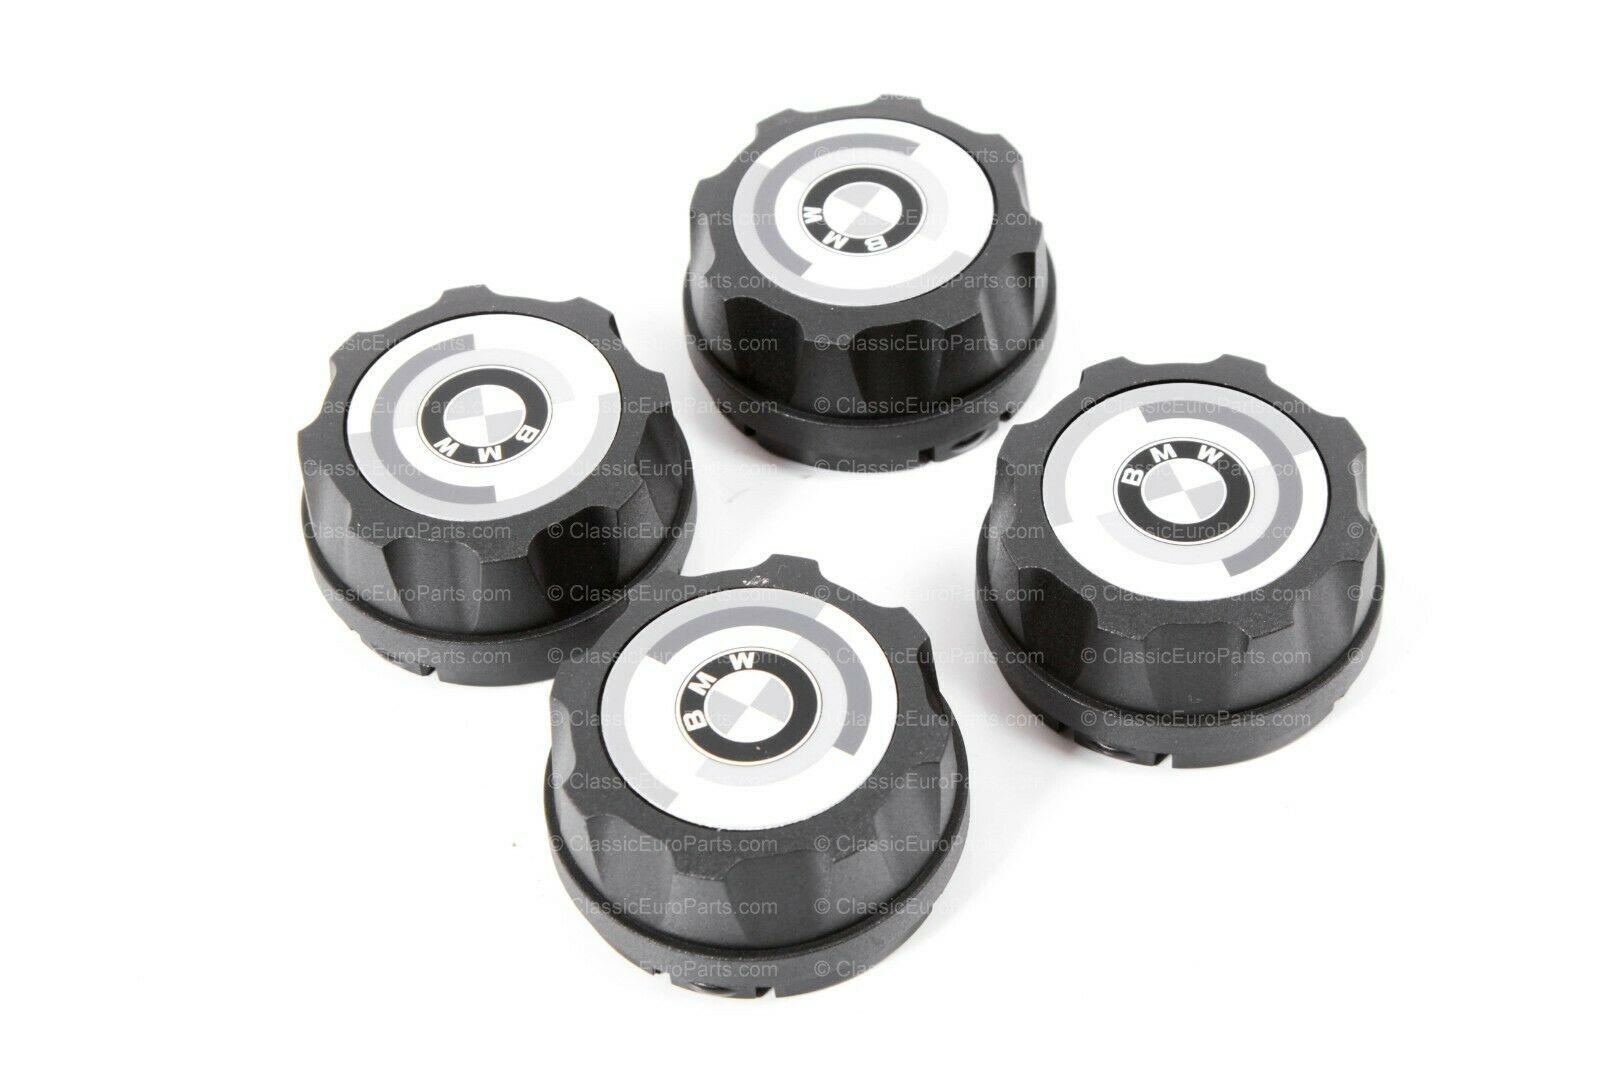 60 Mm Hub Cap Sticker Set For Bbs Mahle Wheels